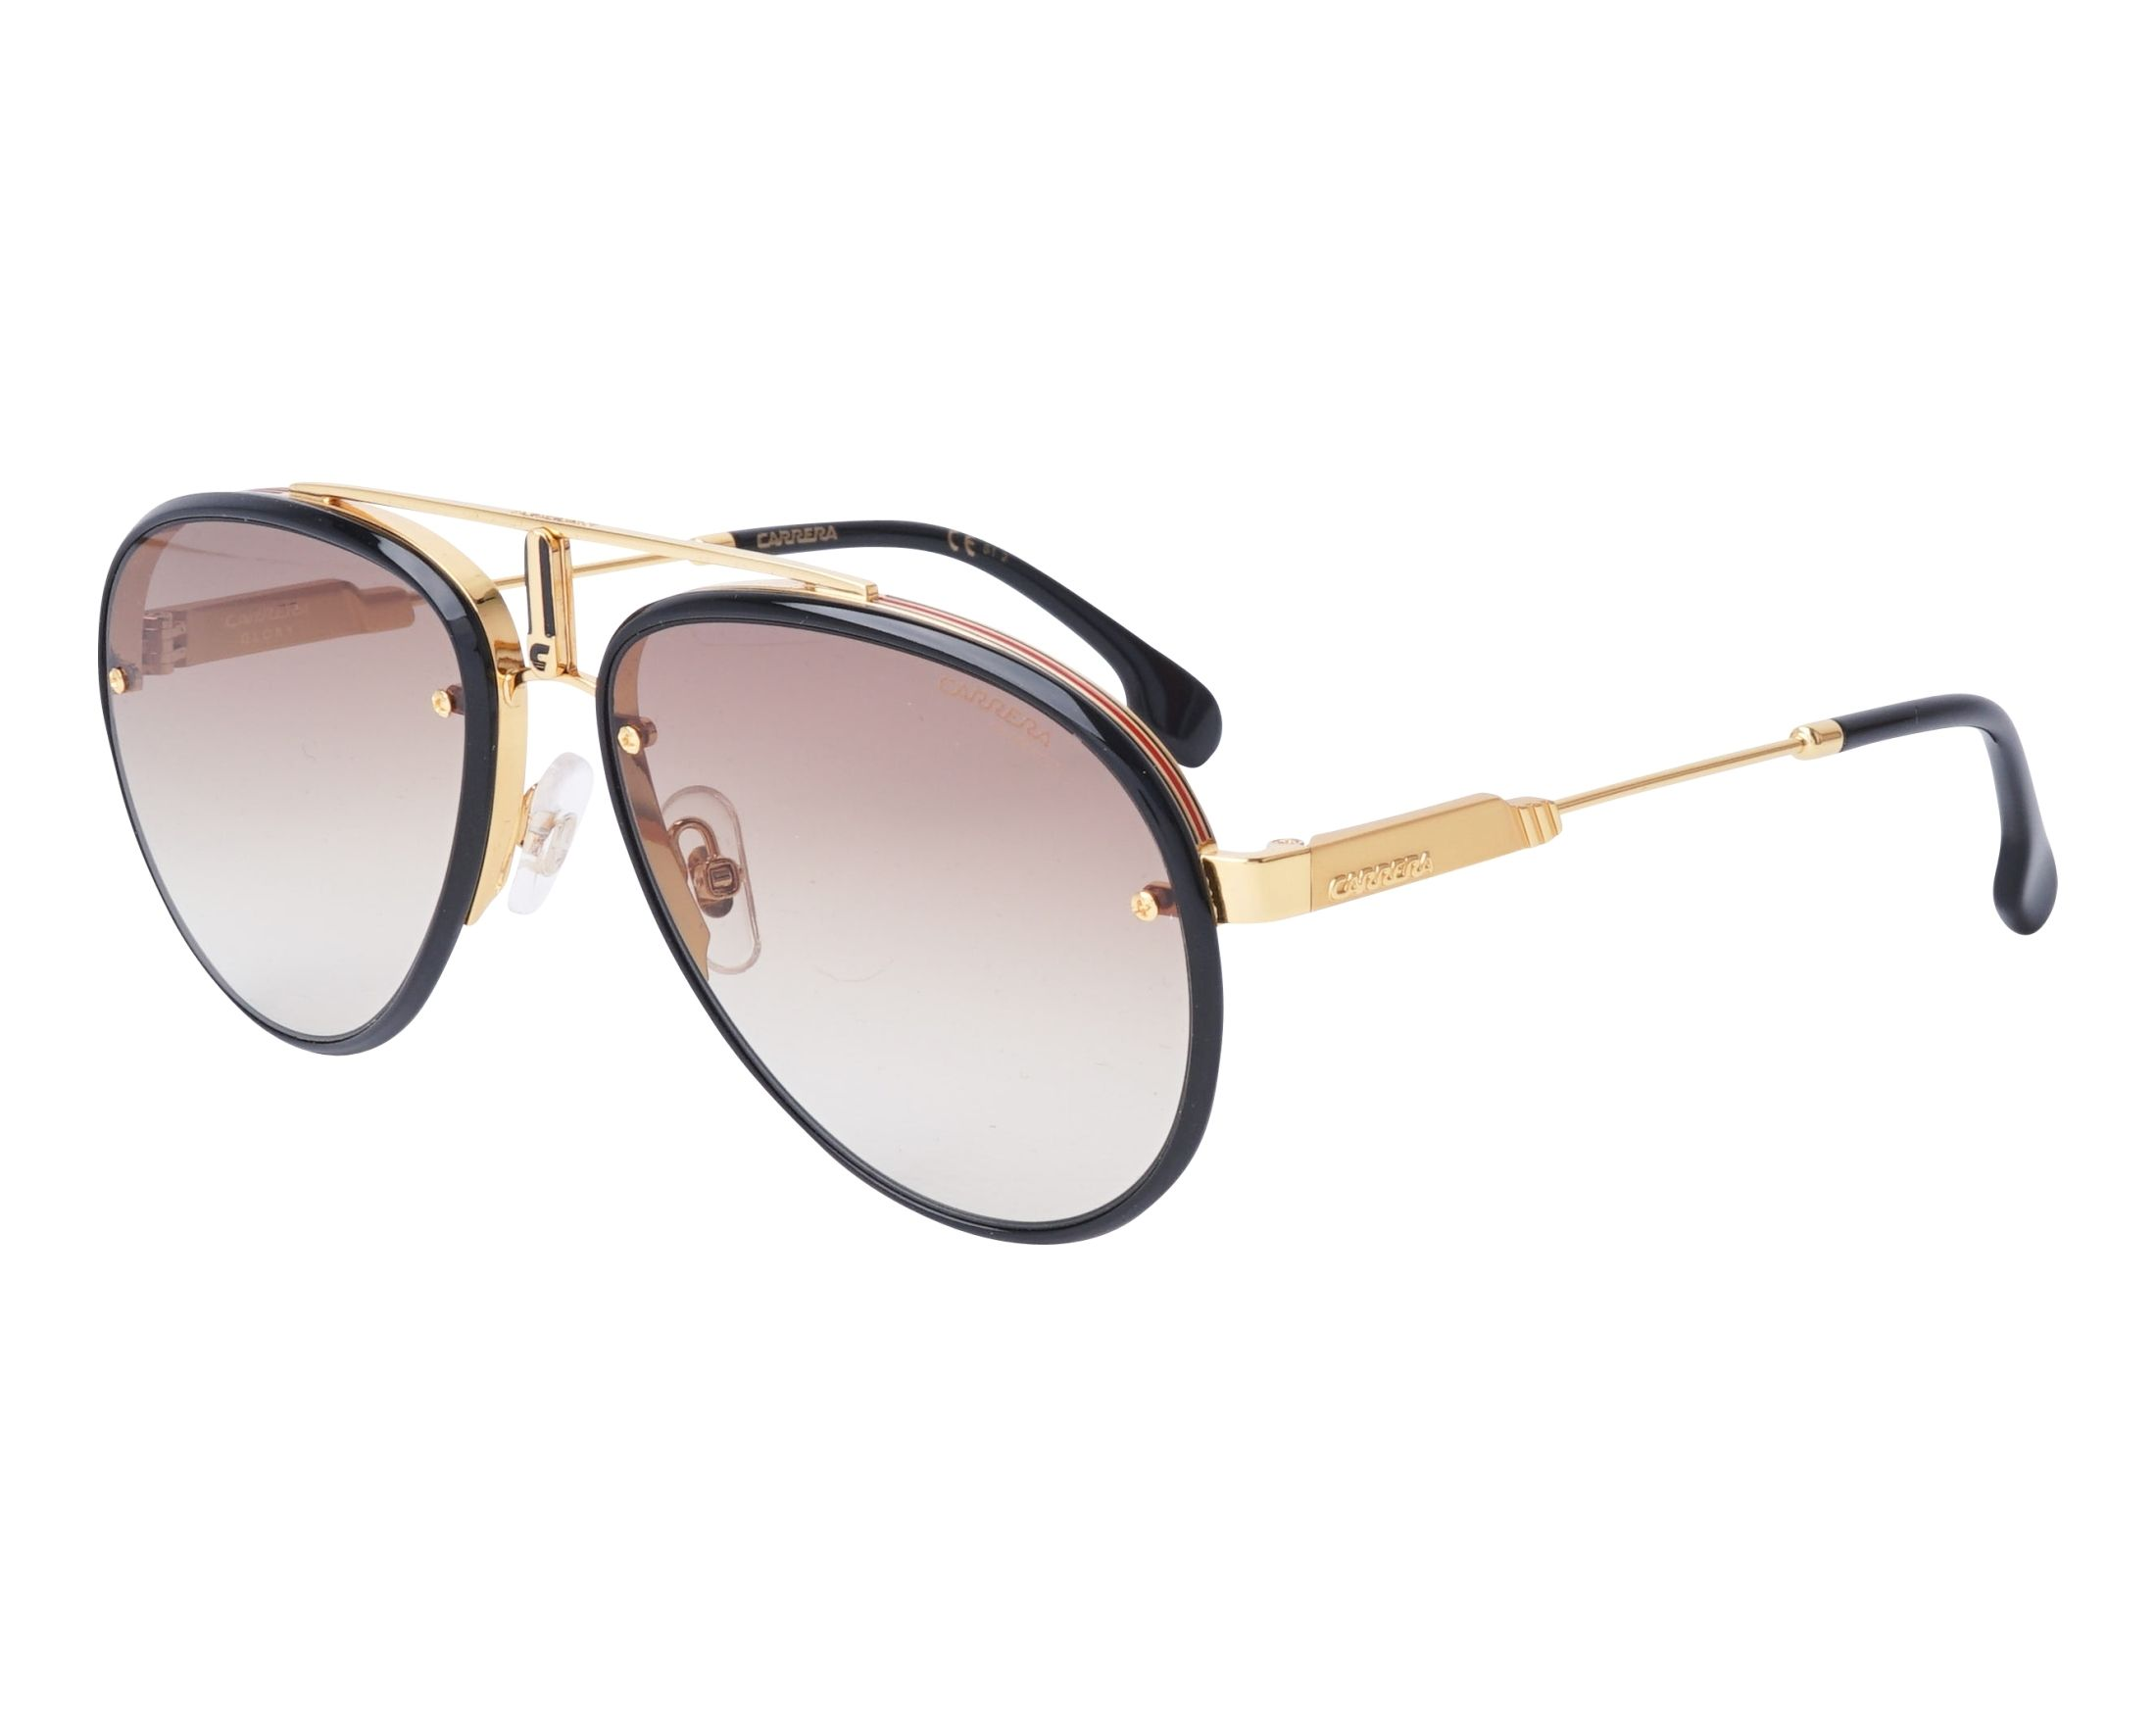 Sunglasses Carrera GLORY 2M286 58-17 Gold Black profile view a2c962b3e45